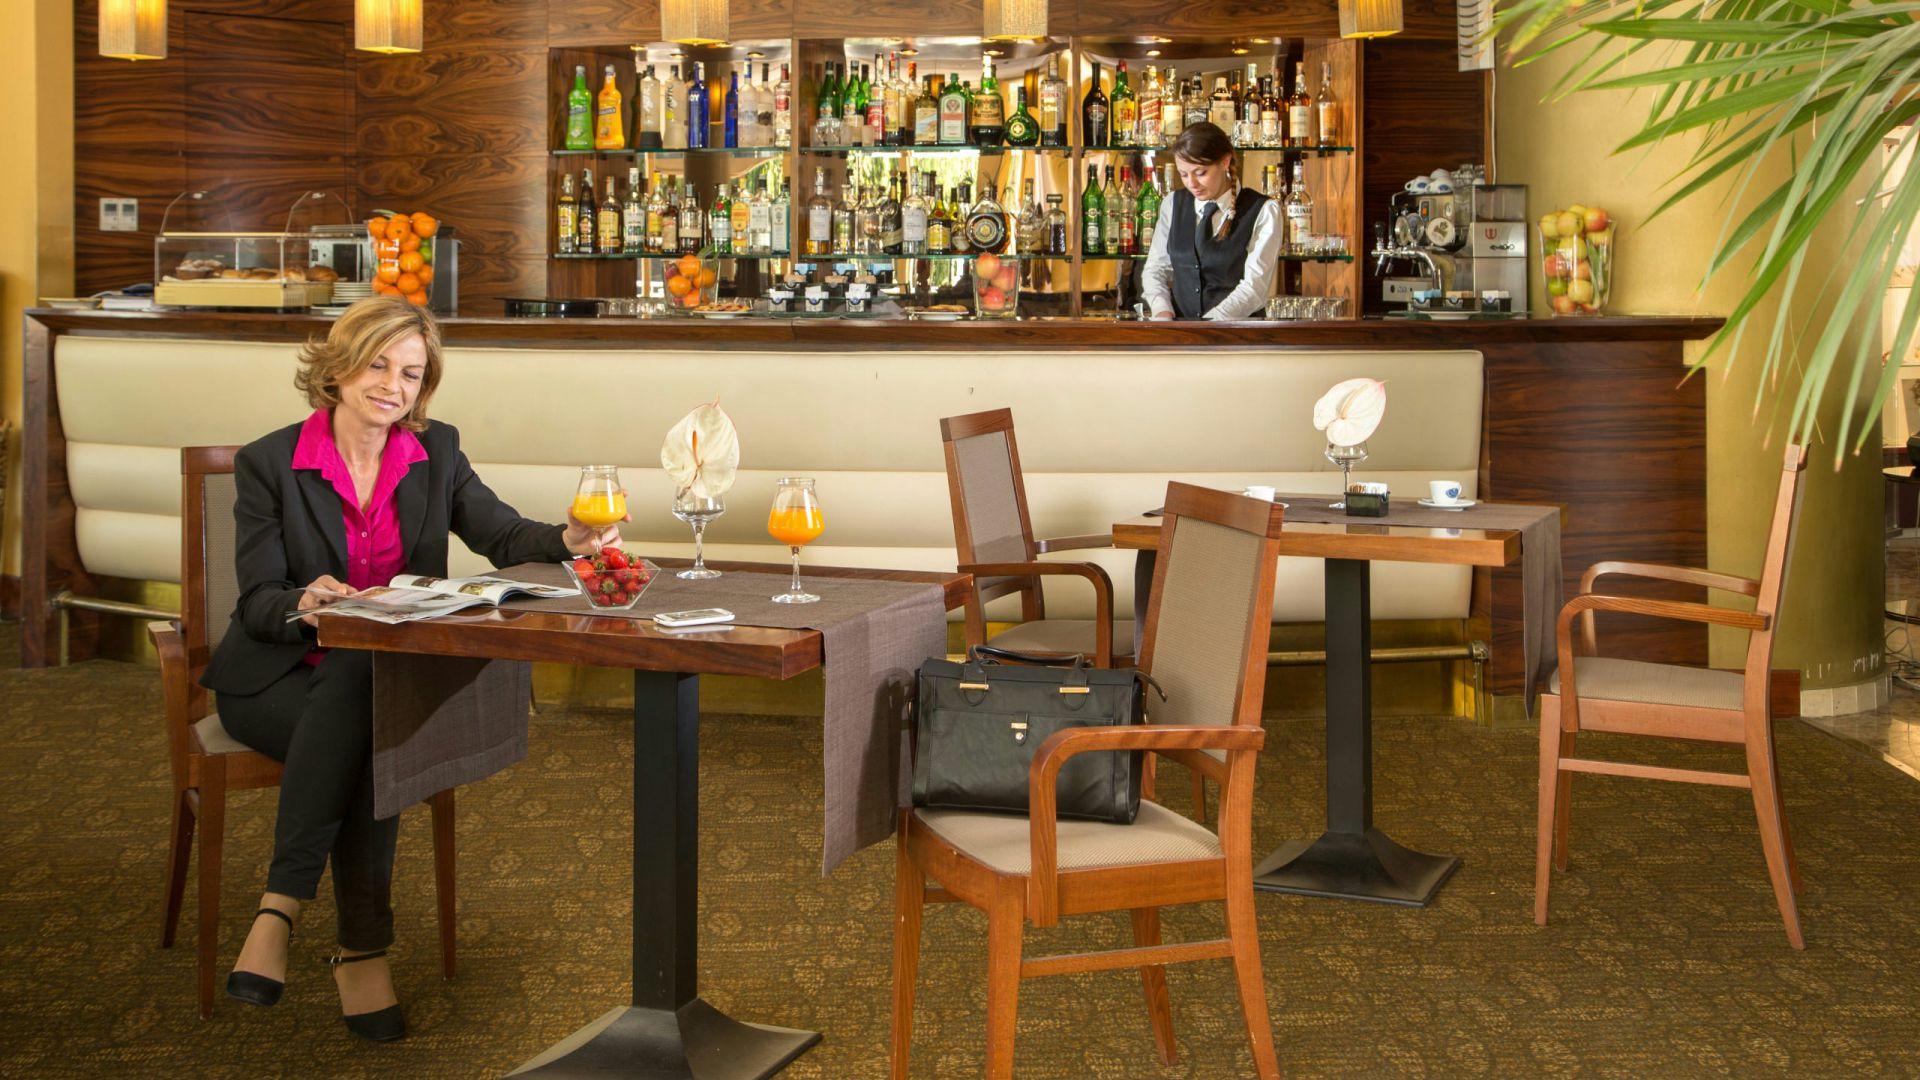 hotel-capannelle-rome-commonareas-09